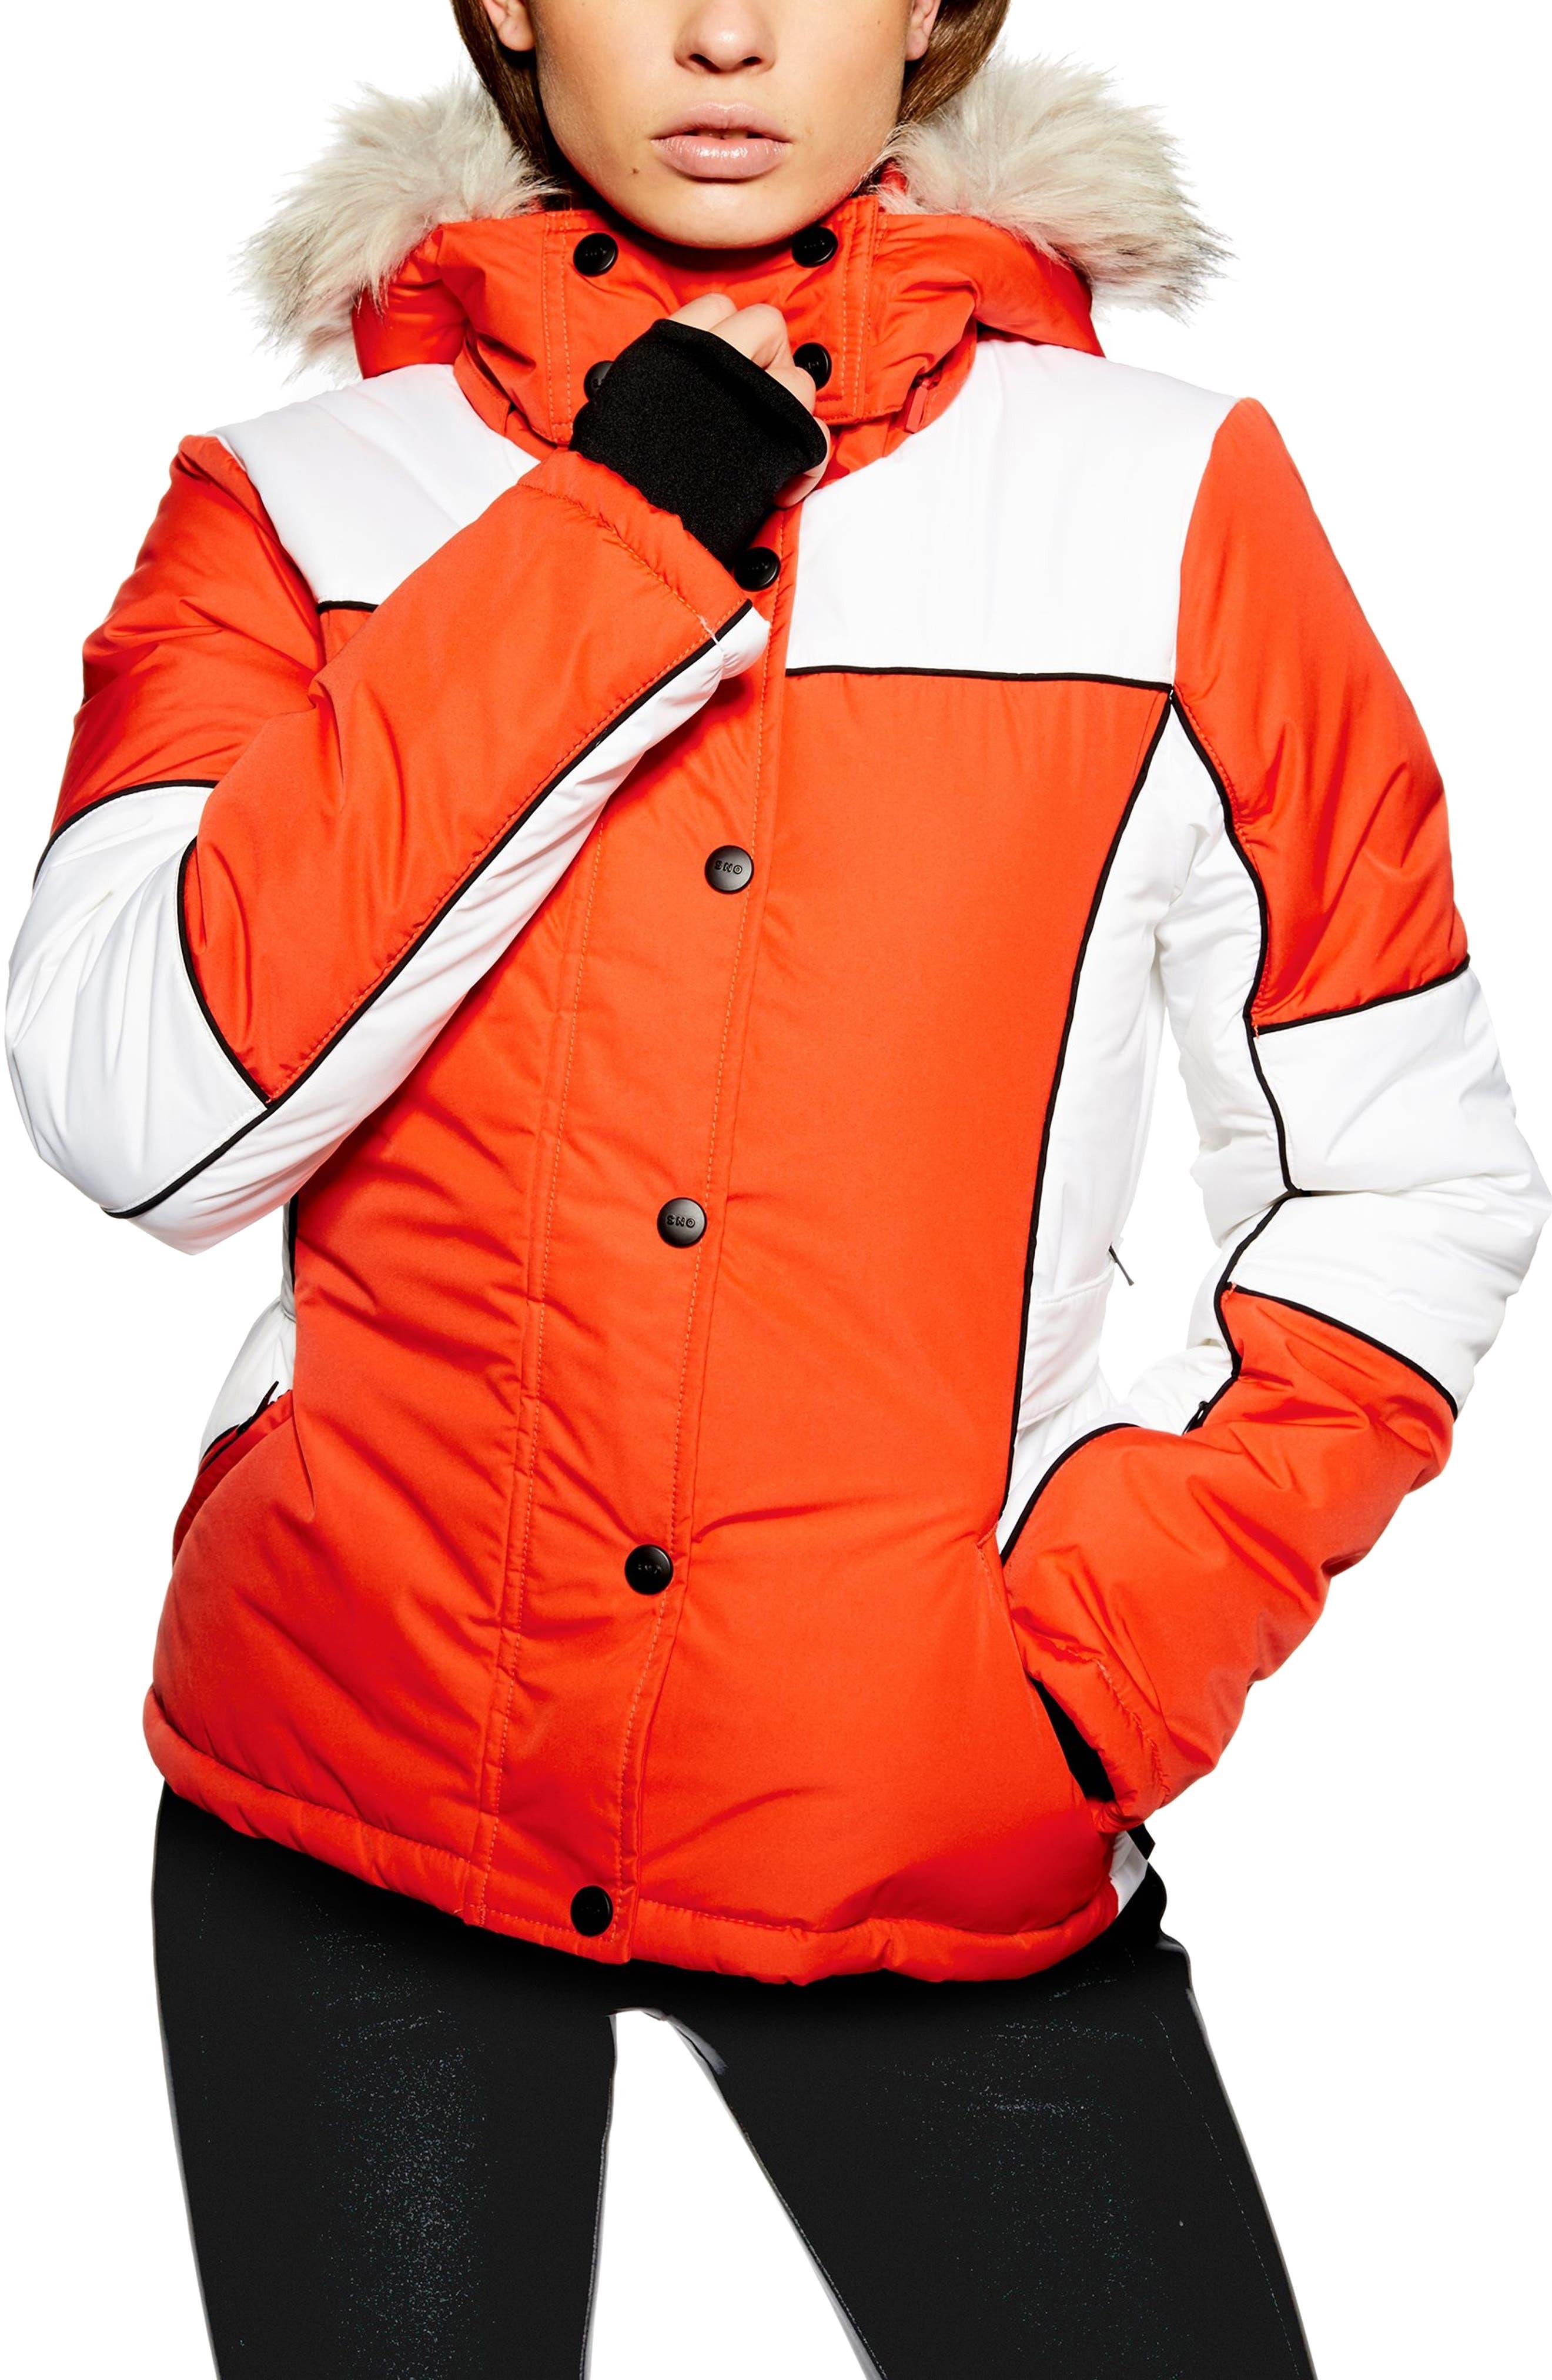 Sno Faux Fur Trim Puffer Jacket,                             Main thumbnail 1, color,                             ORANGE MULTI